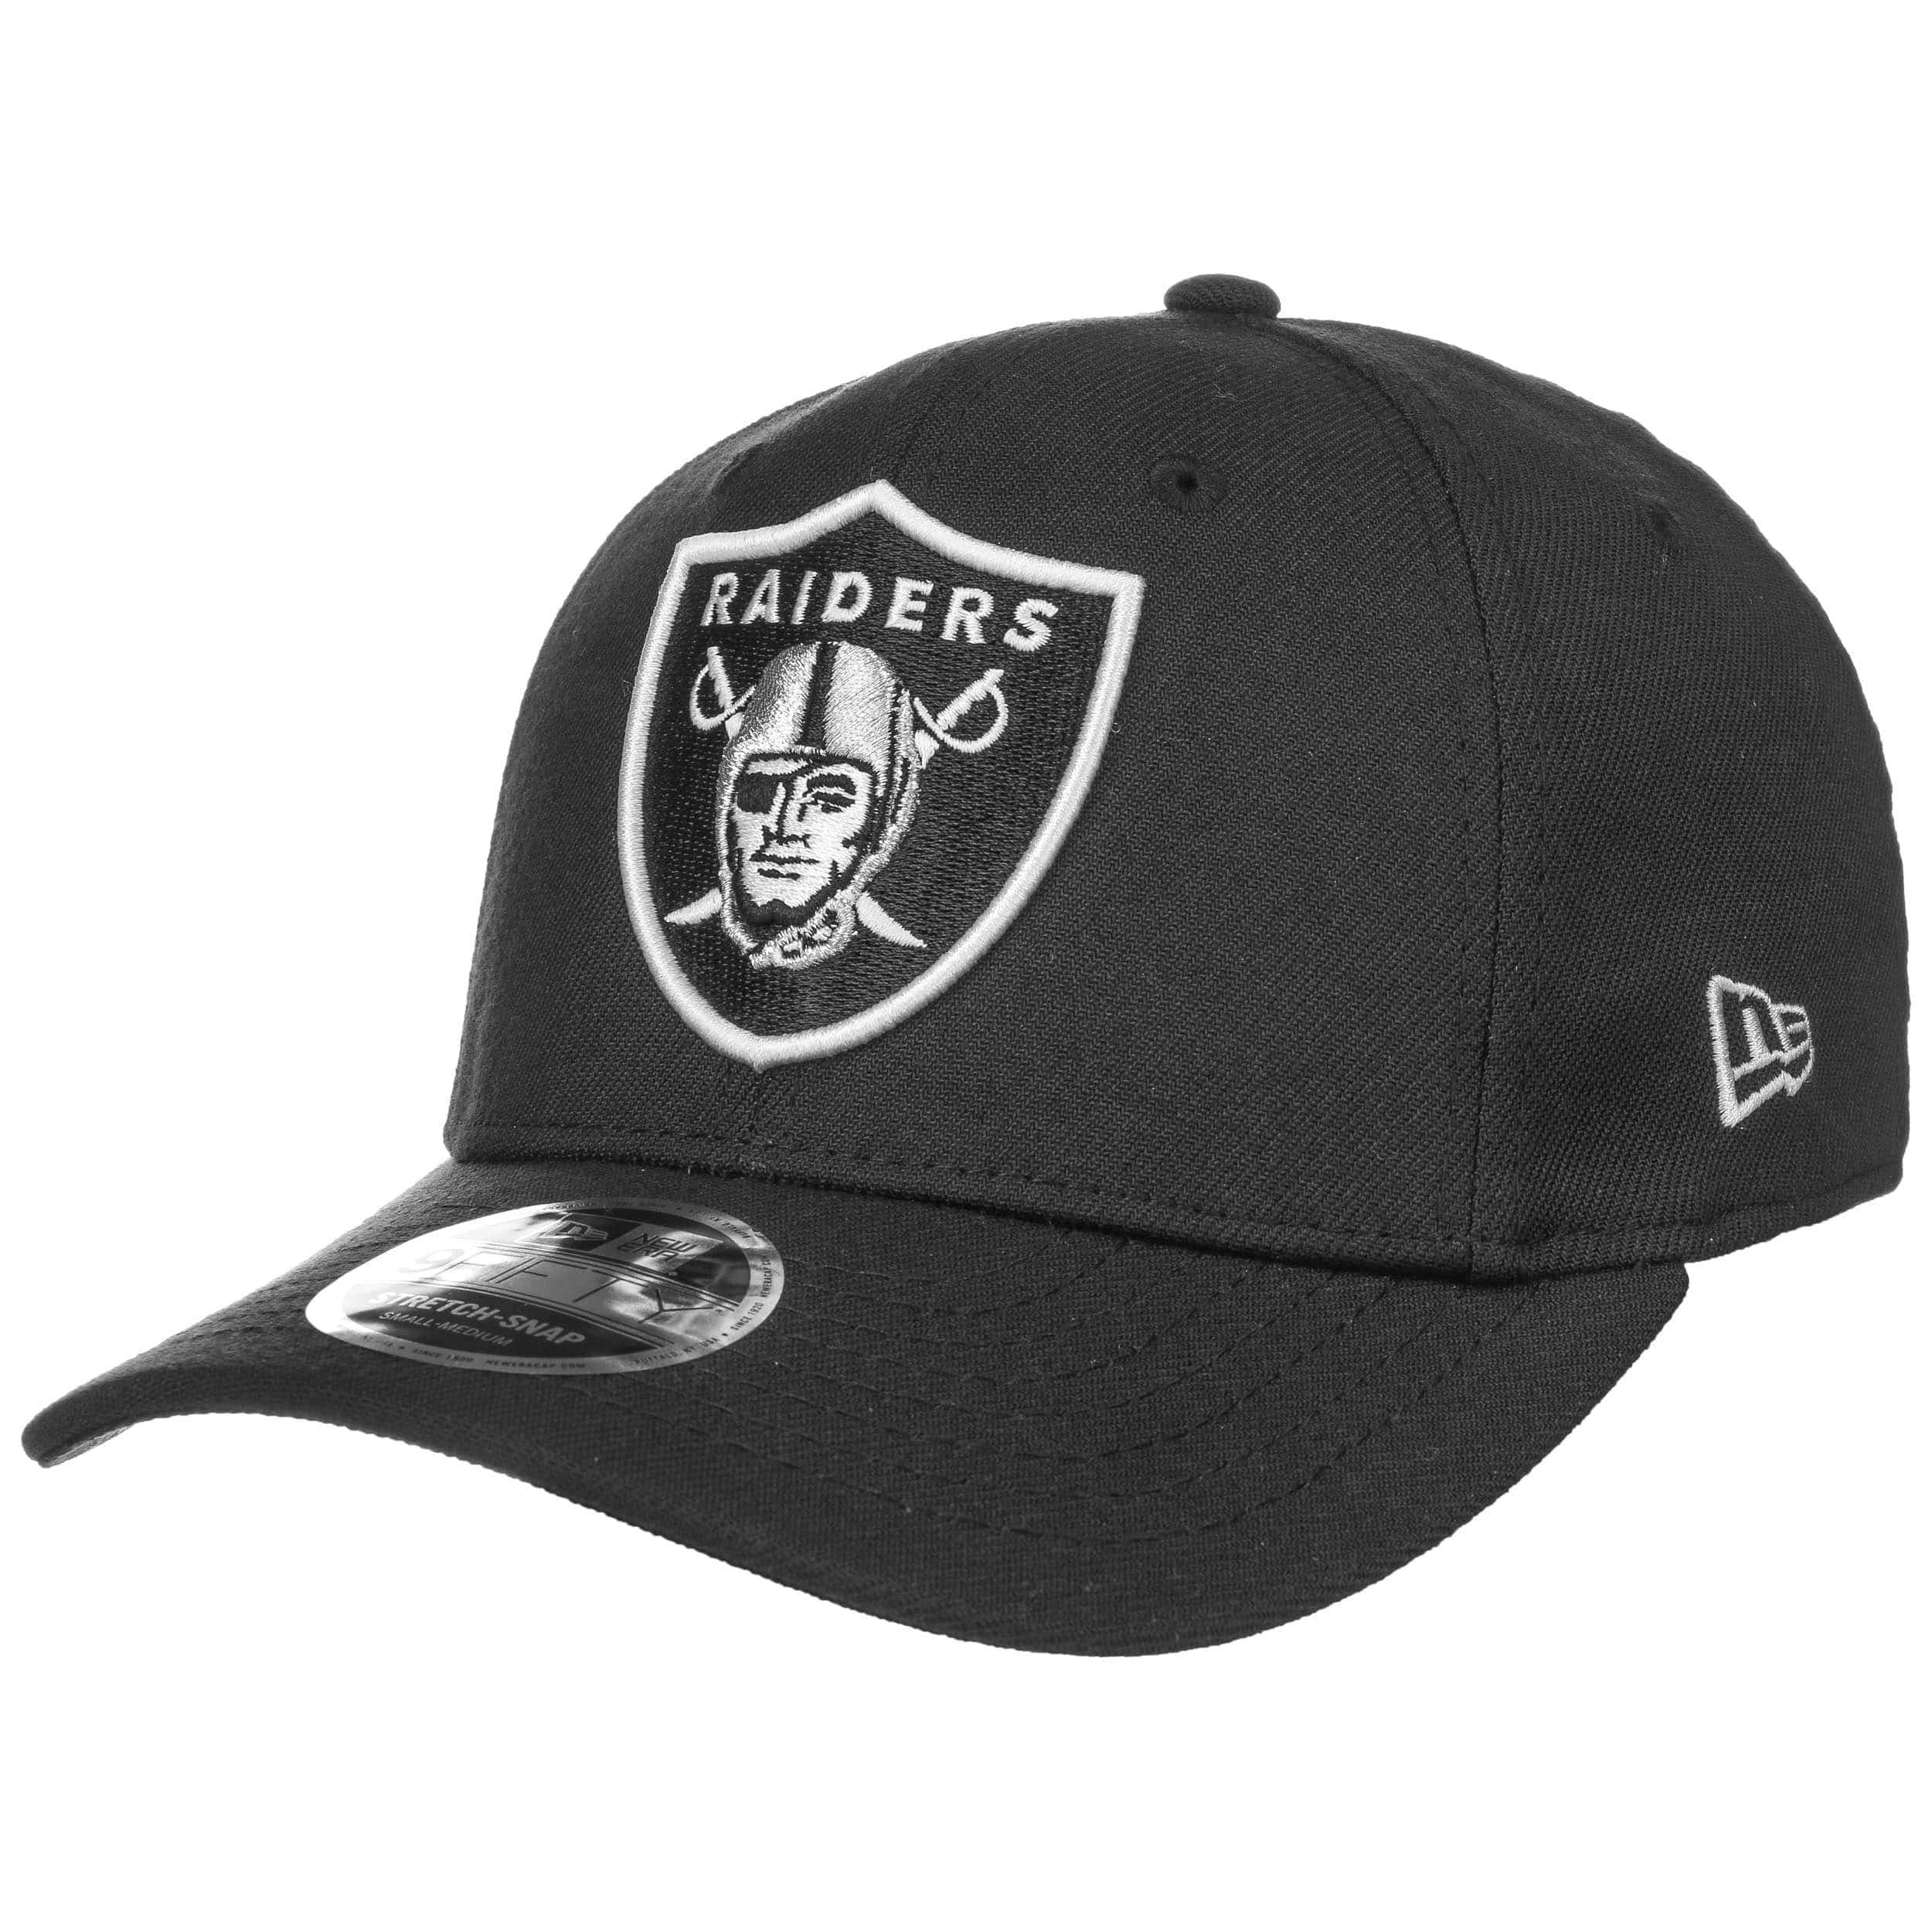 Oakland Raiders New Era 9Fifty Stretch Snapback Cap